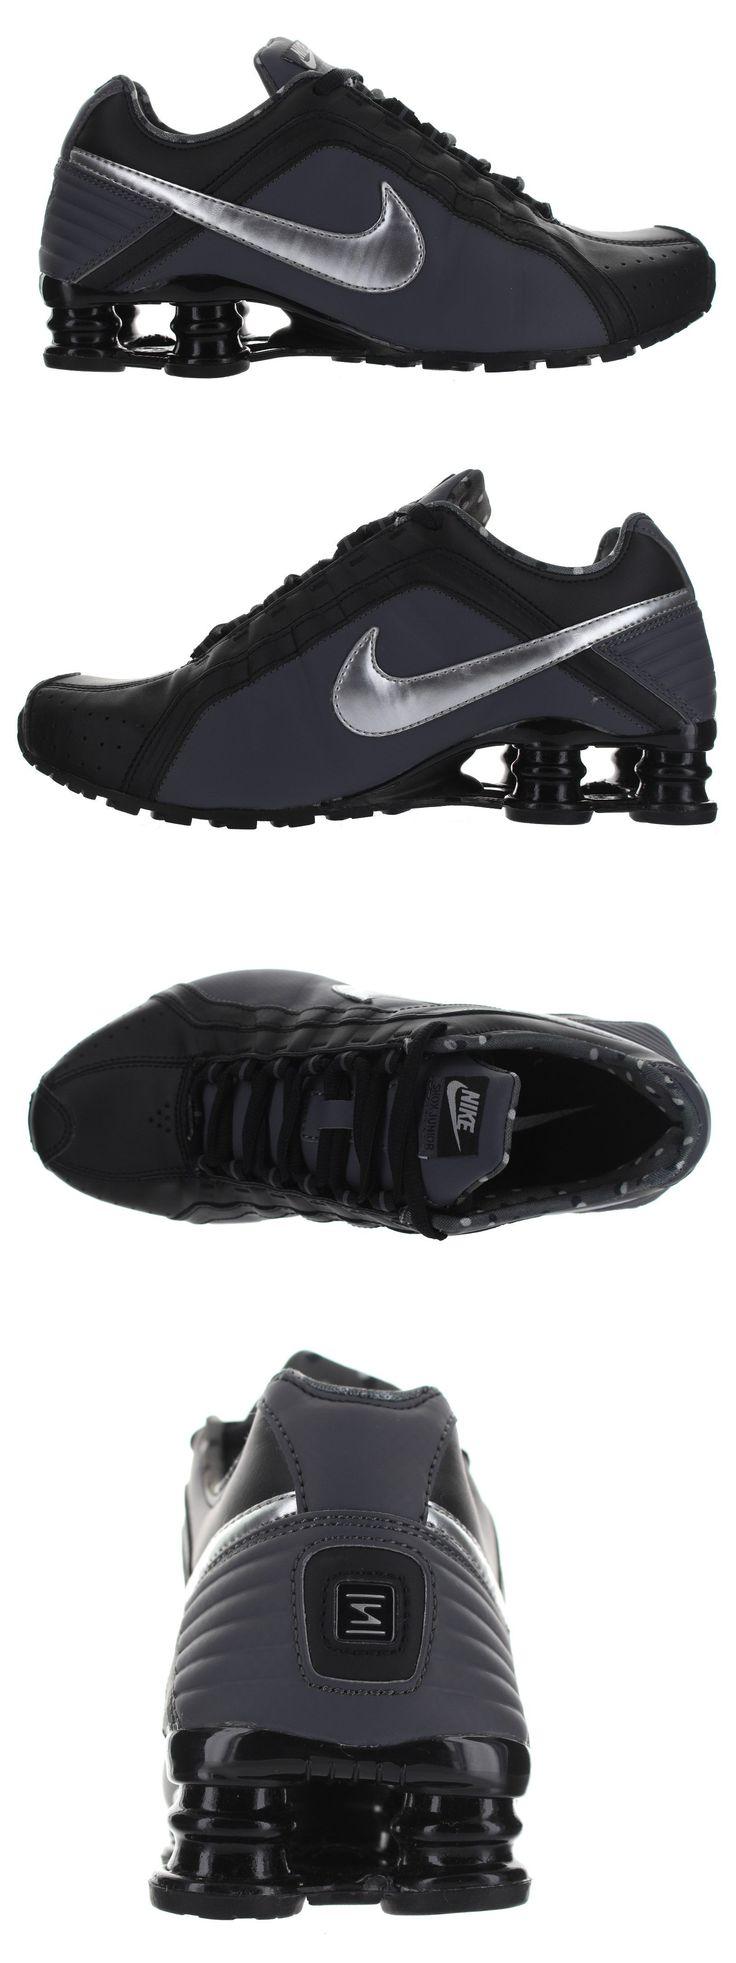 Athletic 95672: Nike Women S Shox Junior Black - Metallic Running Shoes Multiple Size Nib -> BUY IT NOW ONLY: $58.97 on eBay!